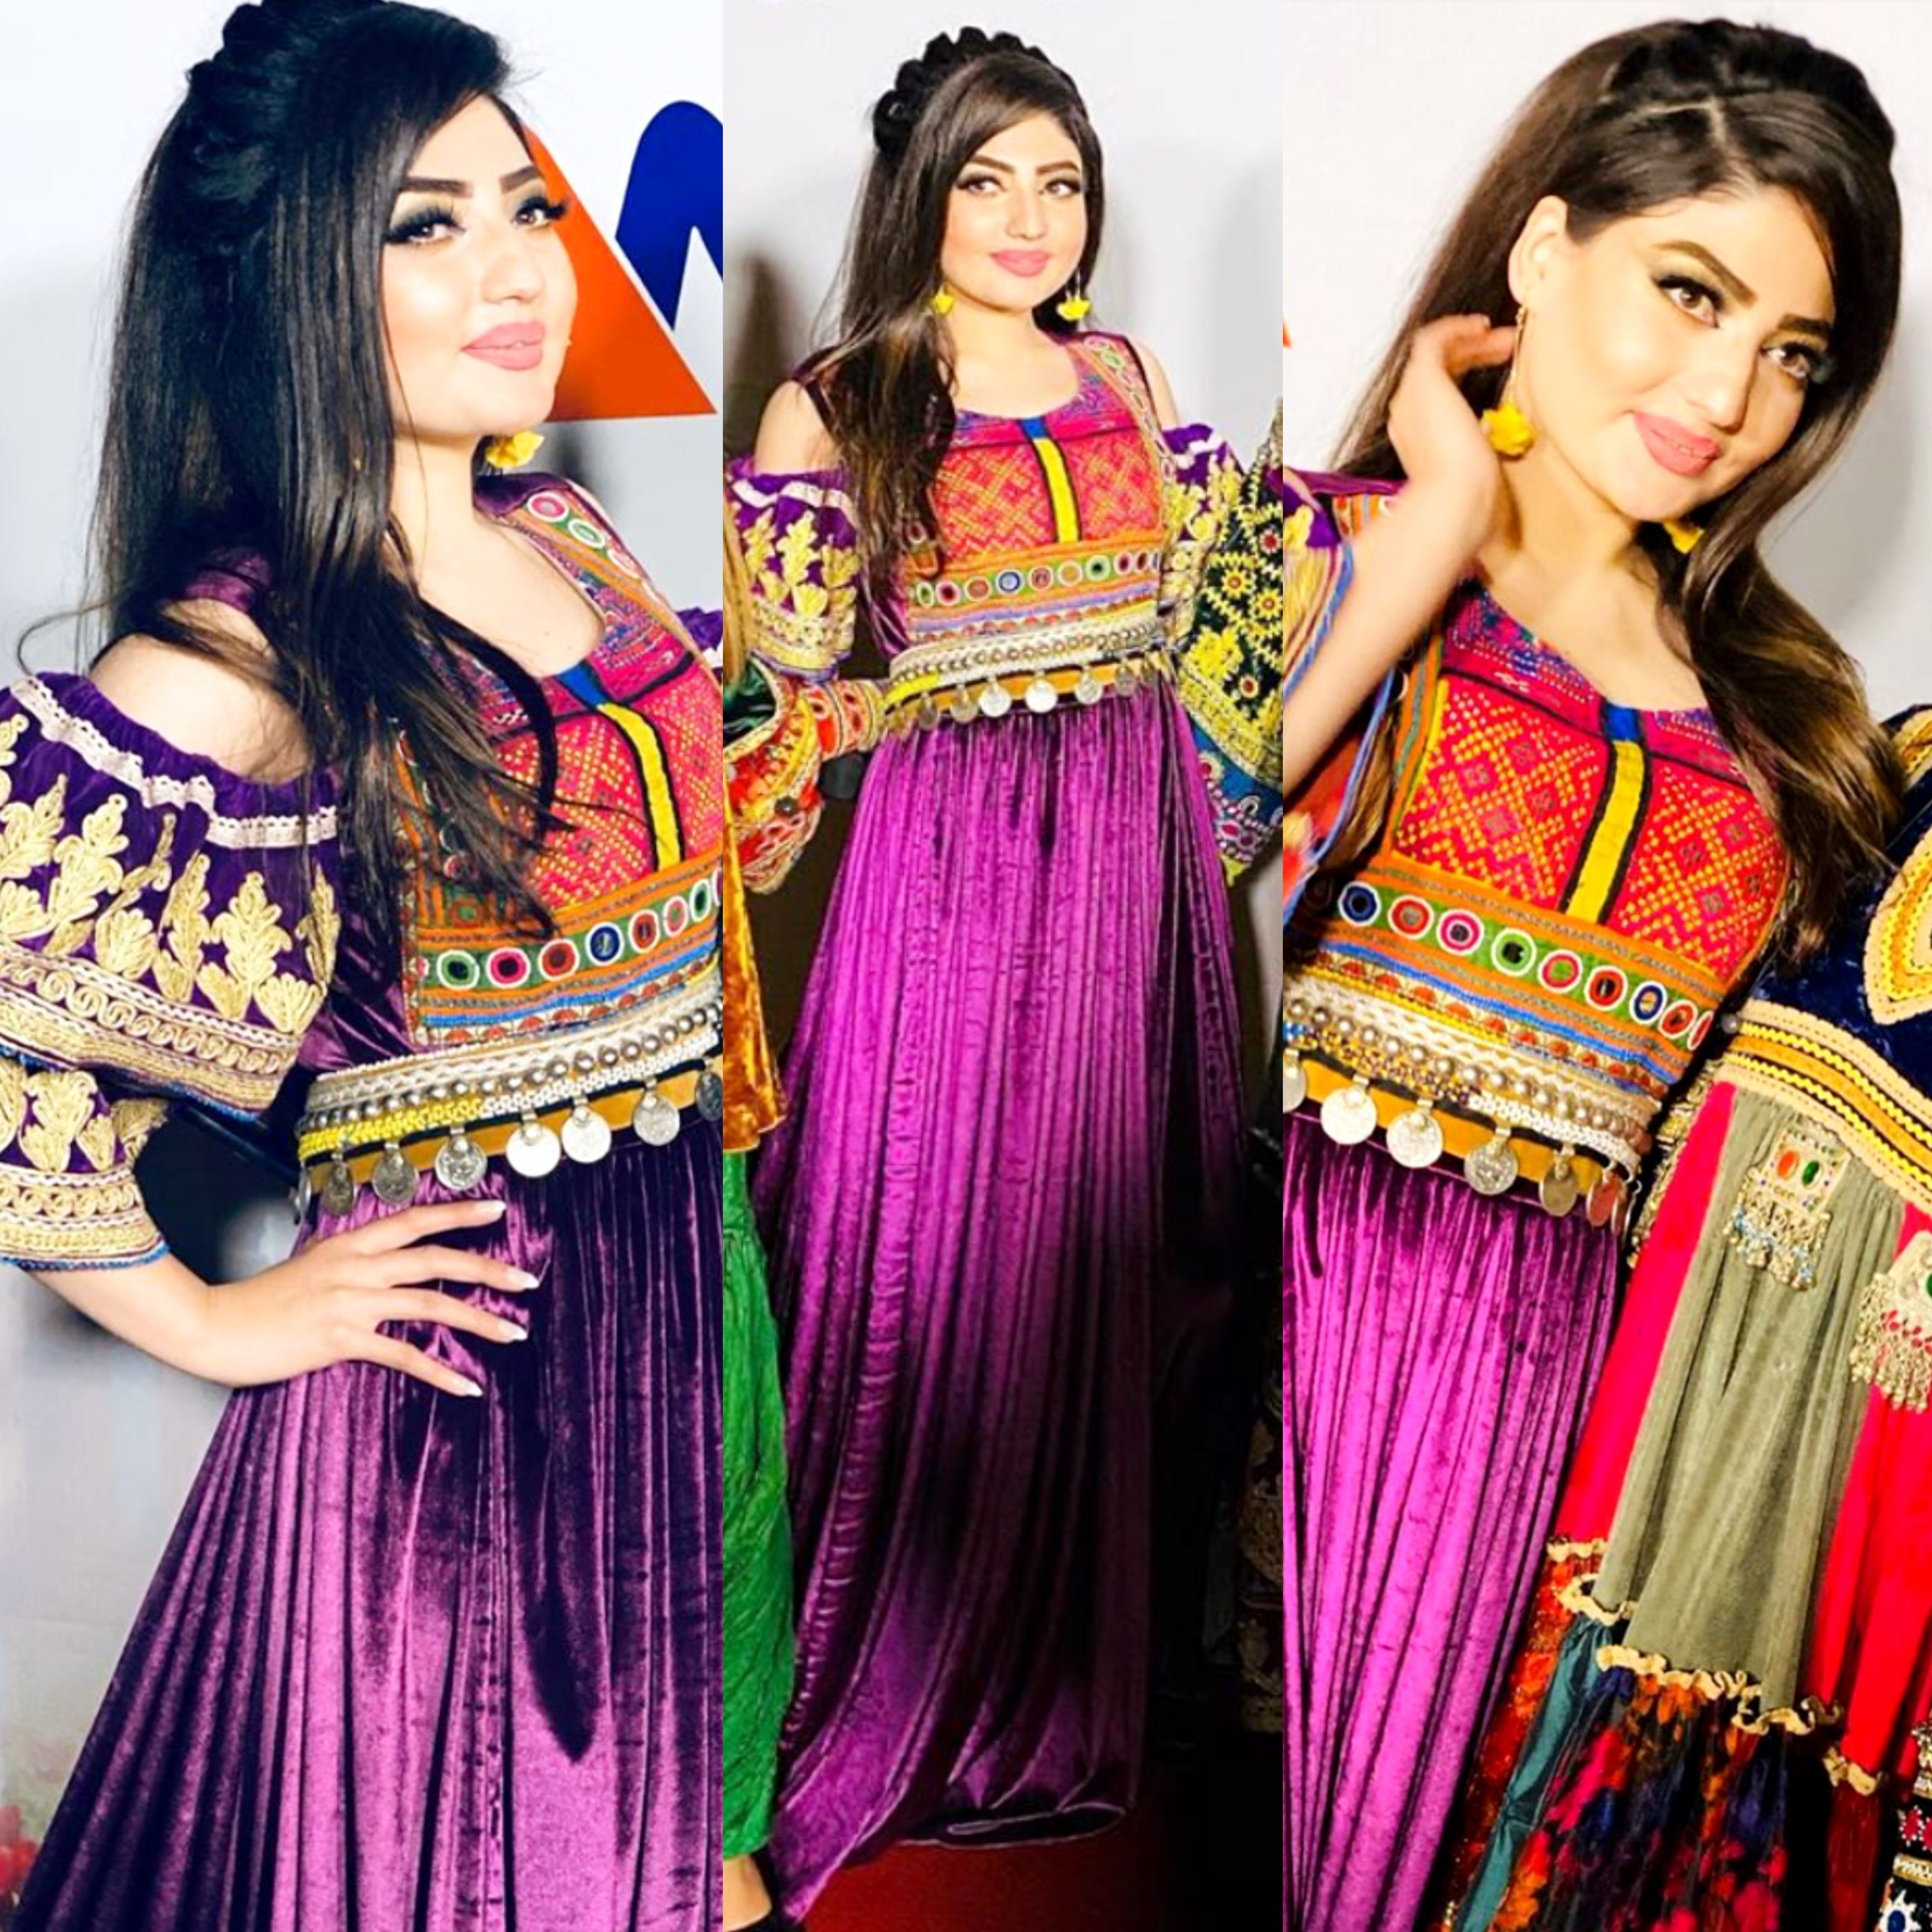 Afghan Afghani Afghanistan Dress Afghan Clothes Afghani Clothes Afghan Dresses